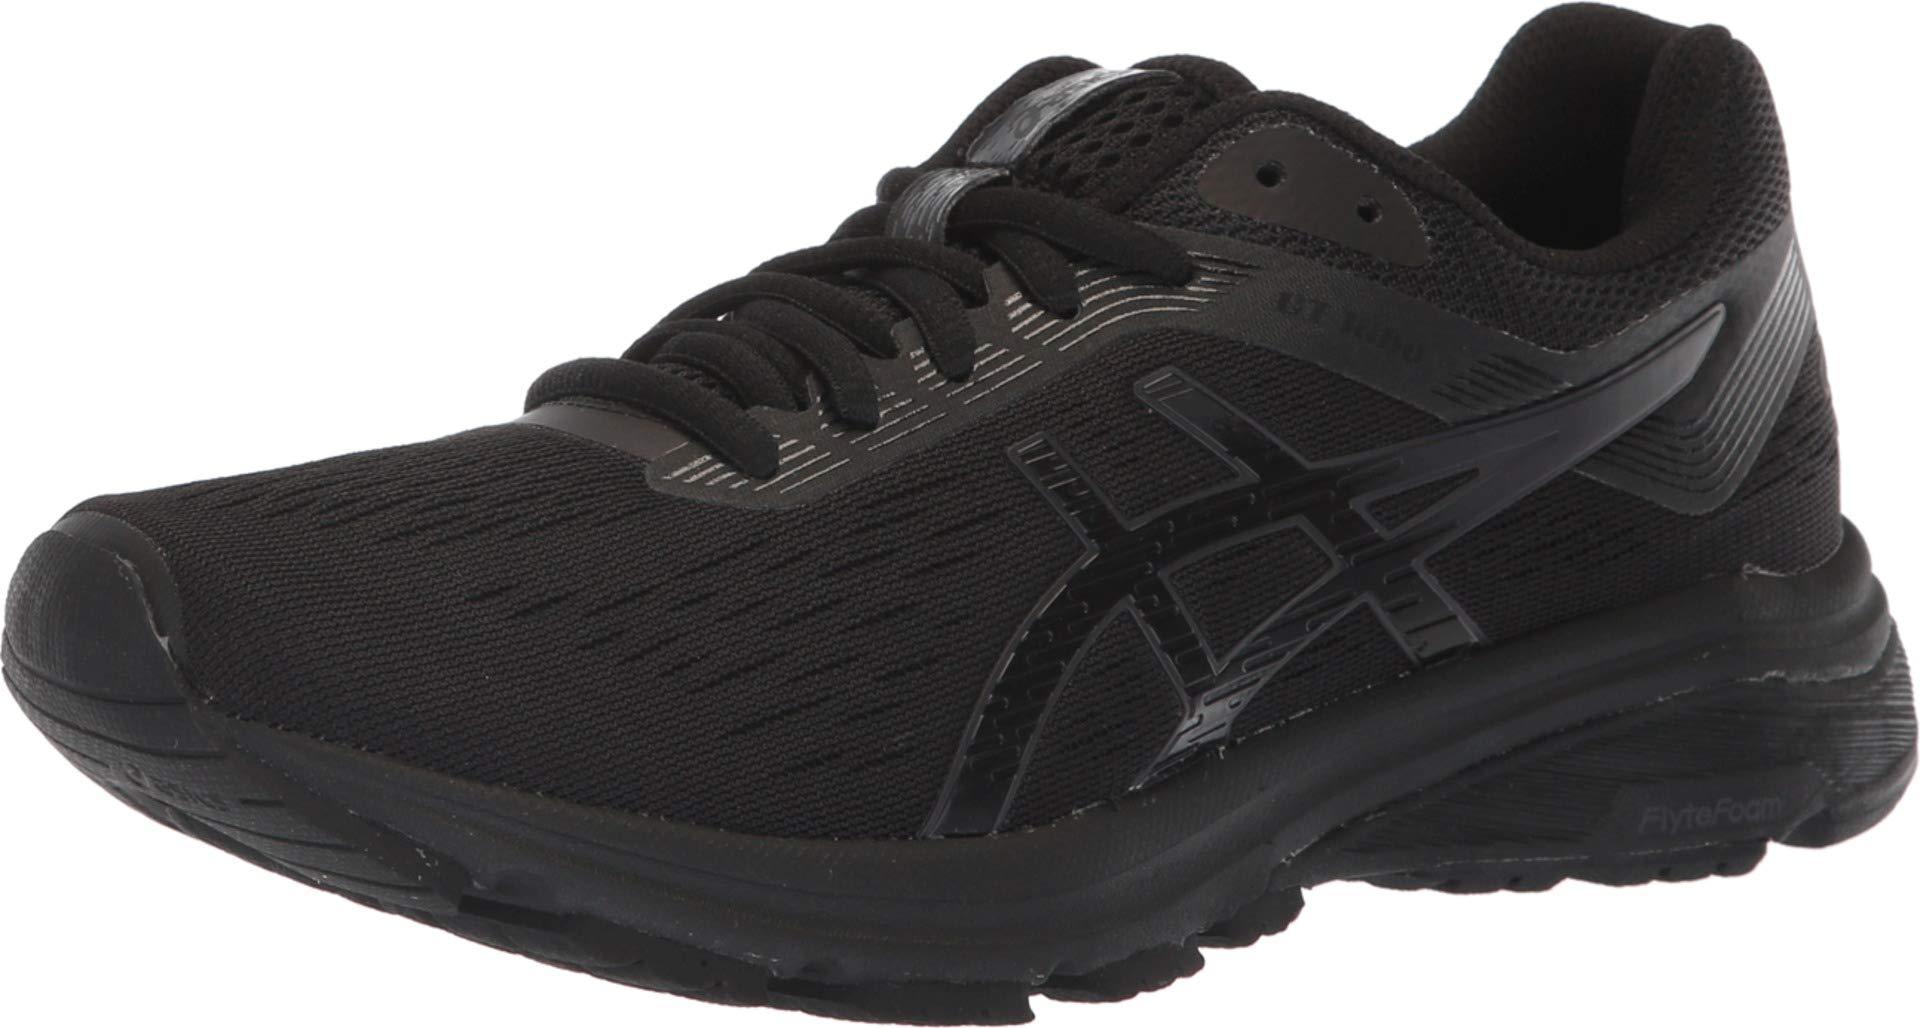 ASICS 1012A030 Women's GT-1000 7 Running Shoe, Black/Phantom, 8.5 M US by ASICS